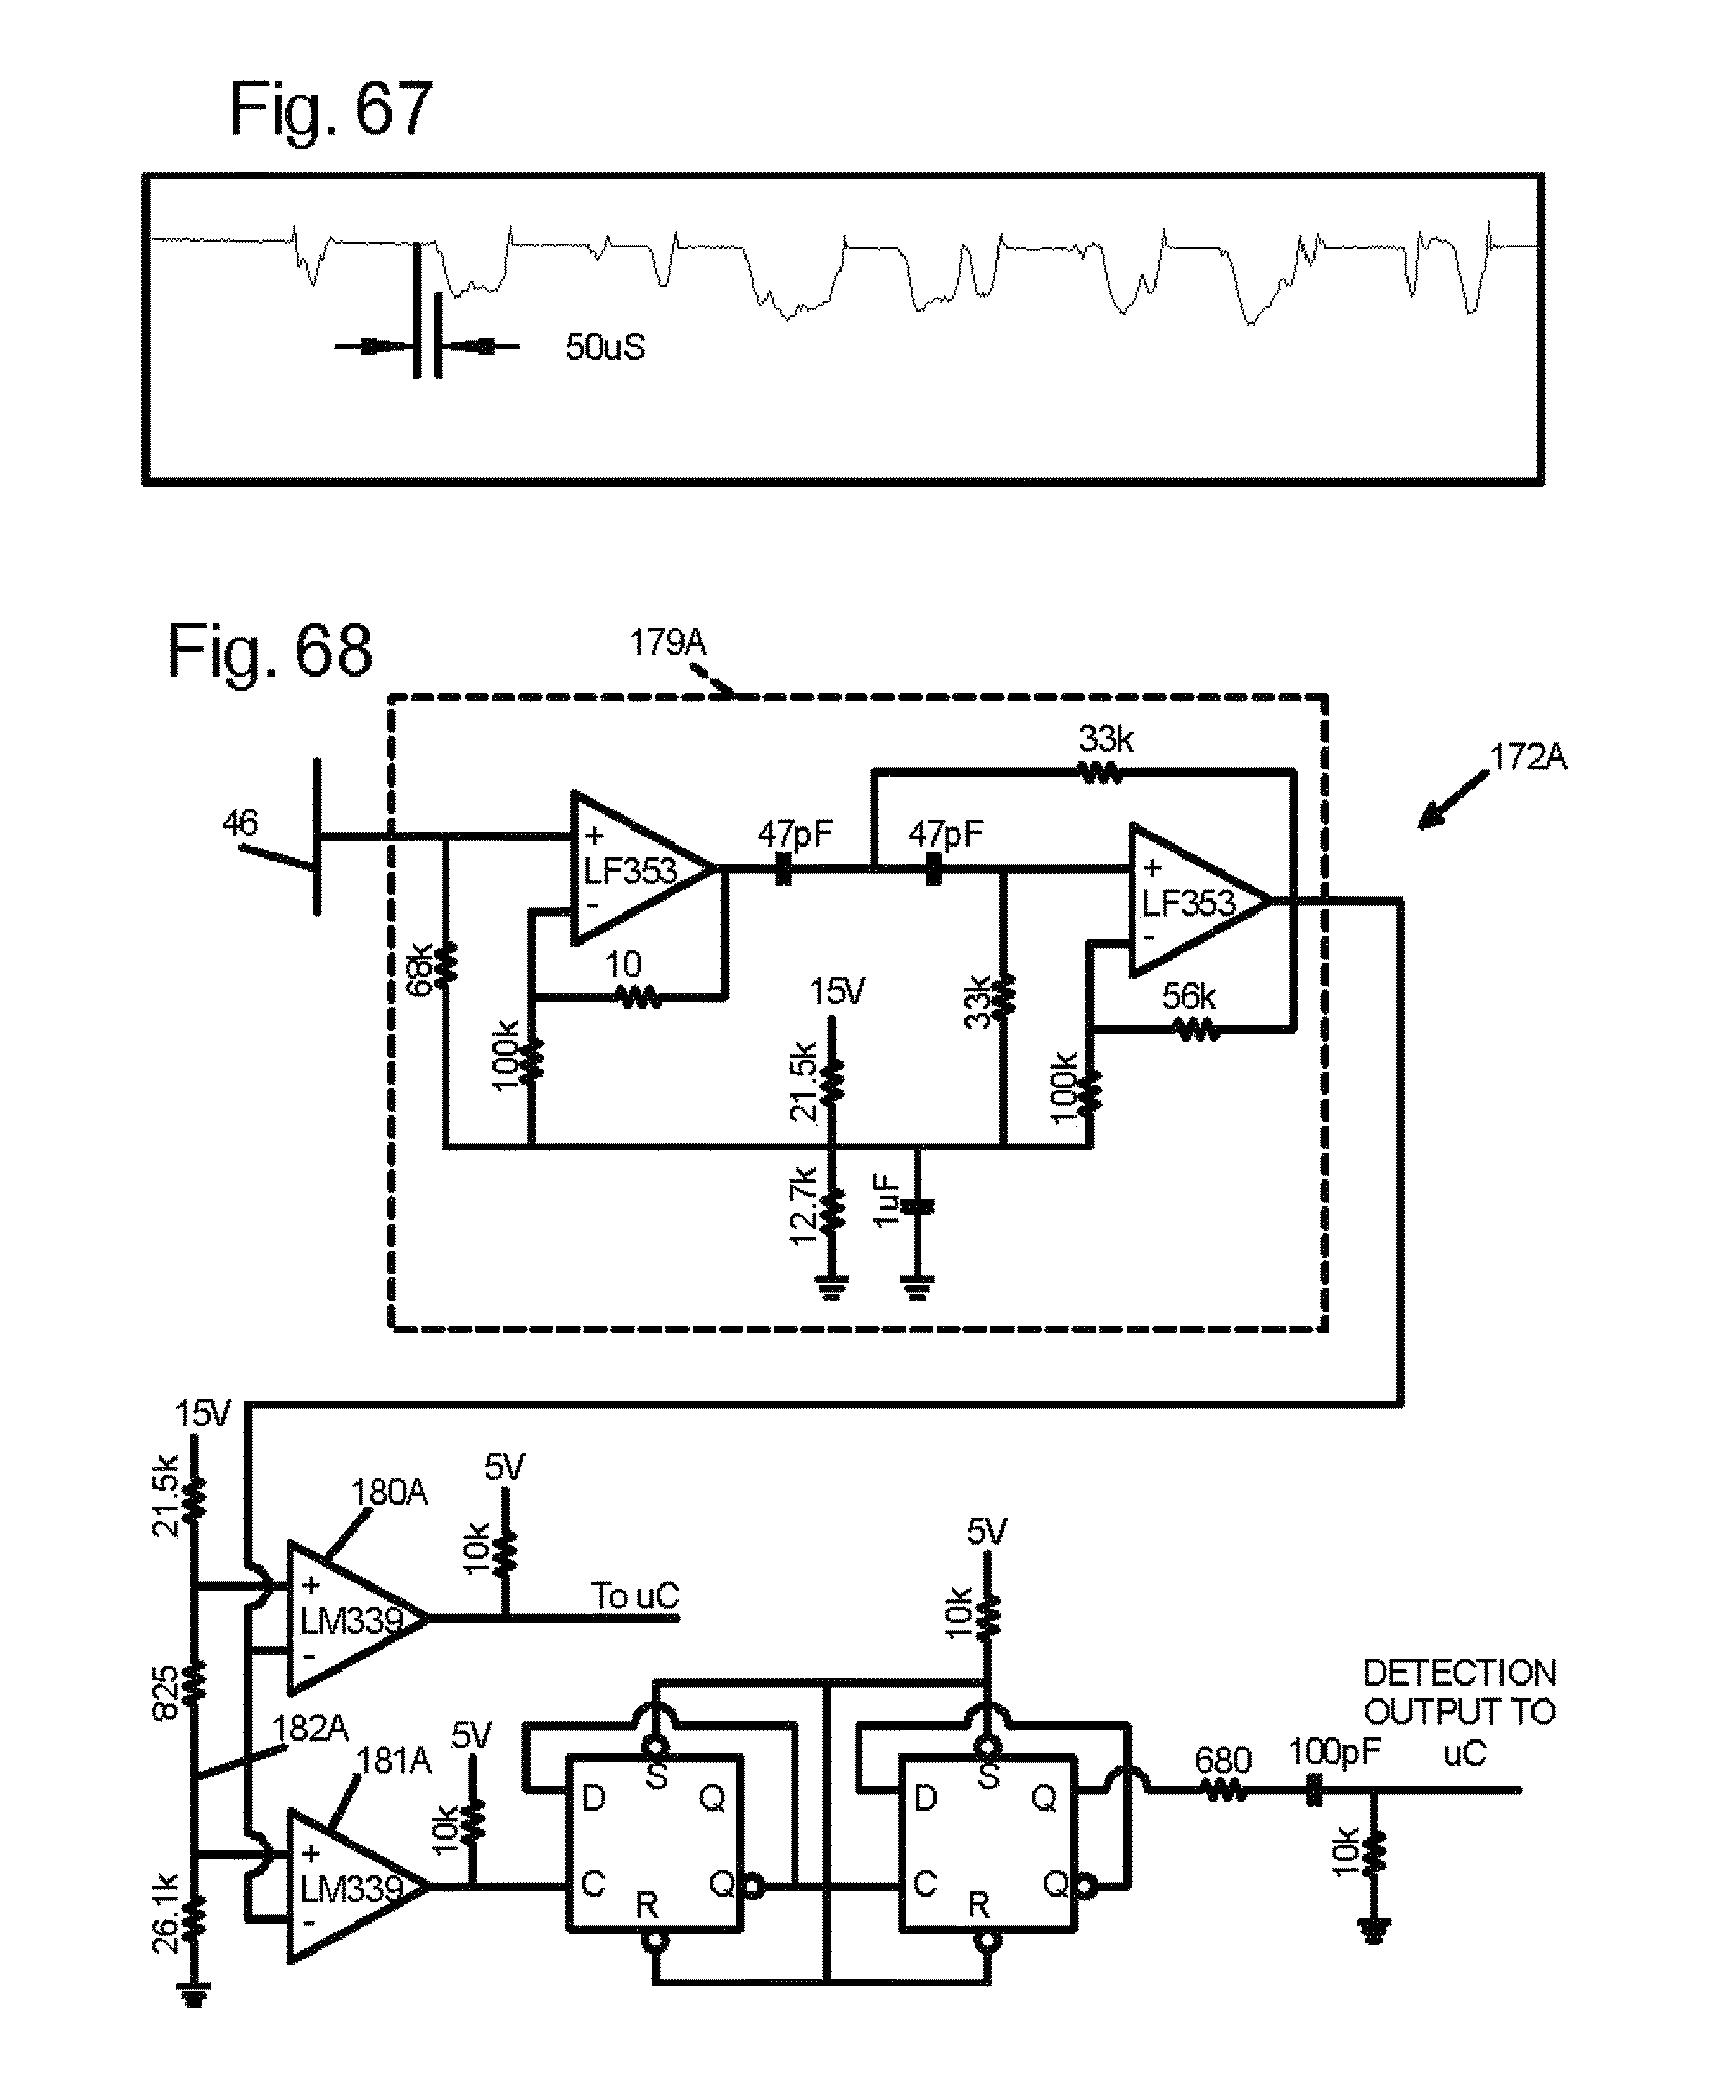 Patent Us 9969014 B2 Wiring Diagram Ac Changhong 0 Petitions